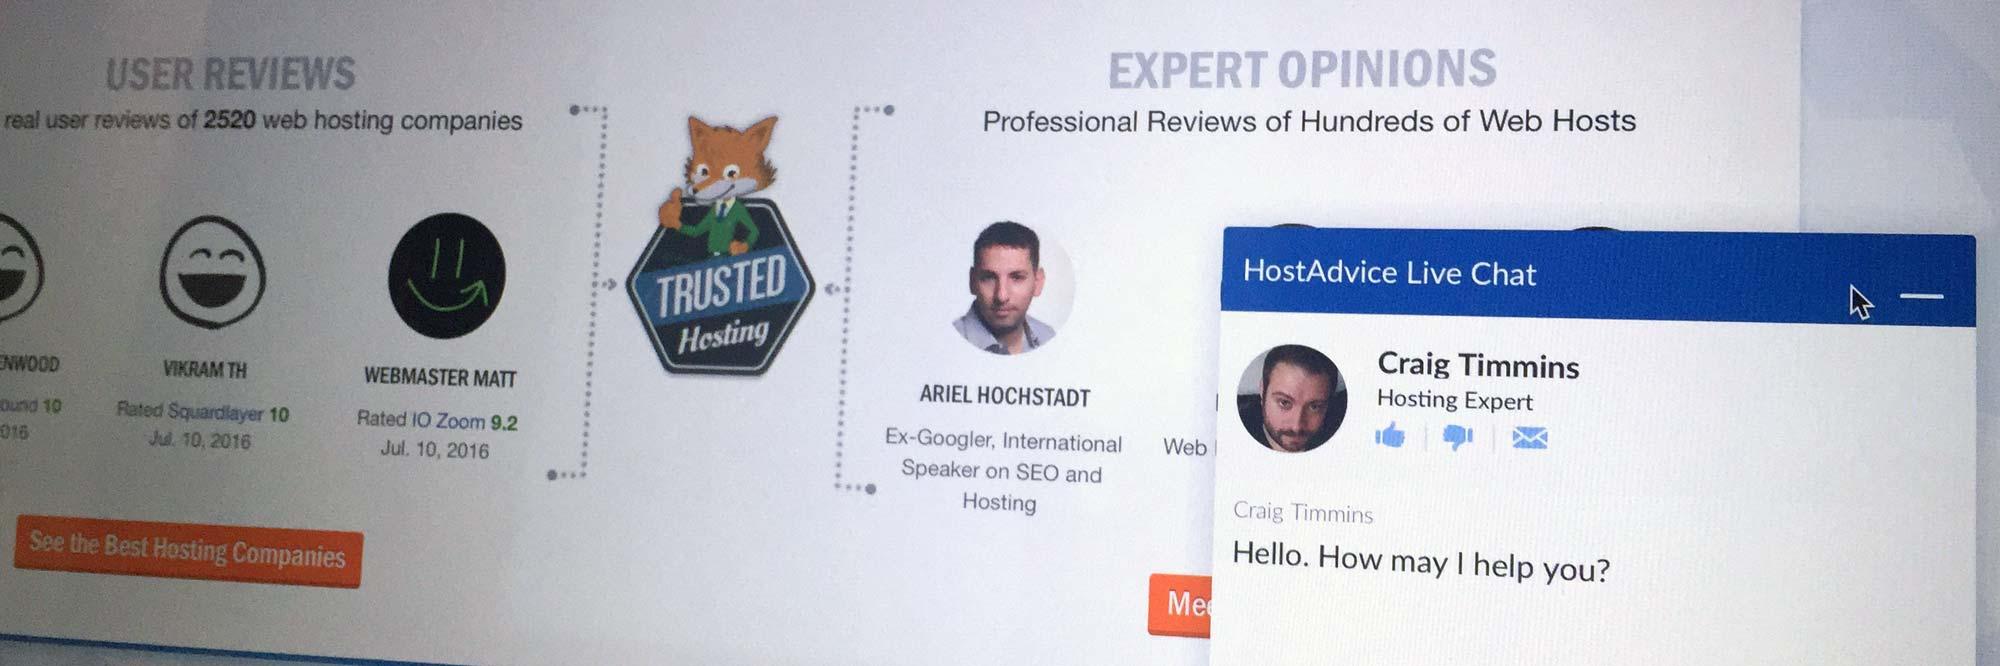 HostAdvice.com